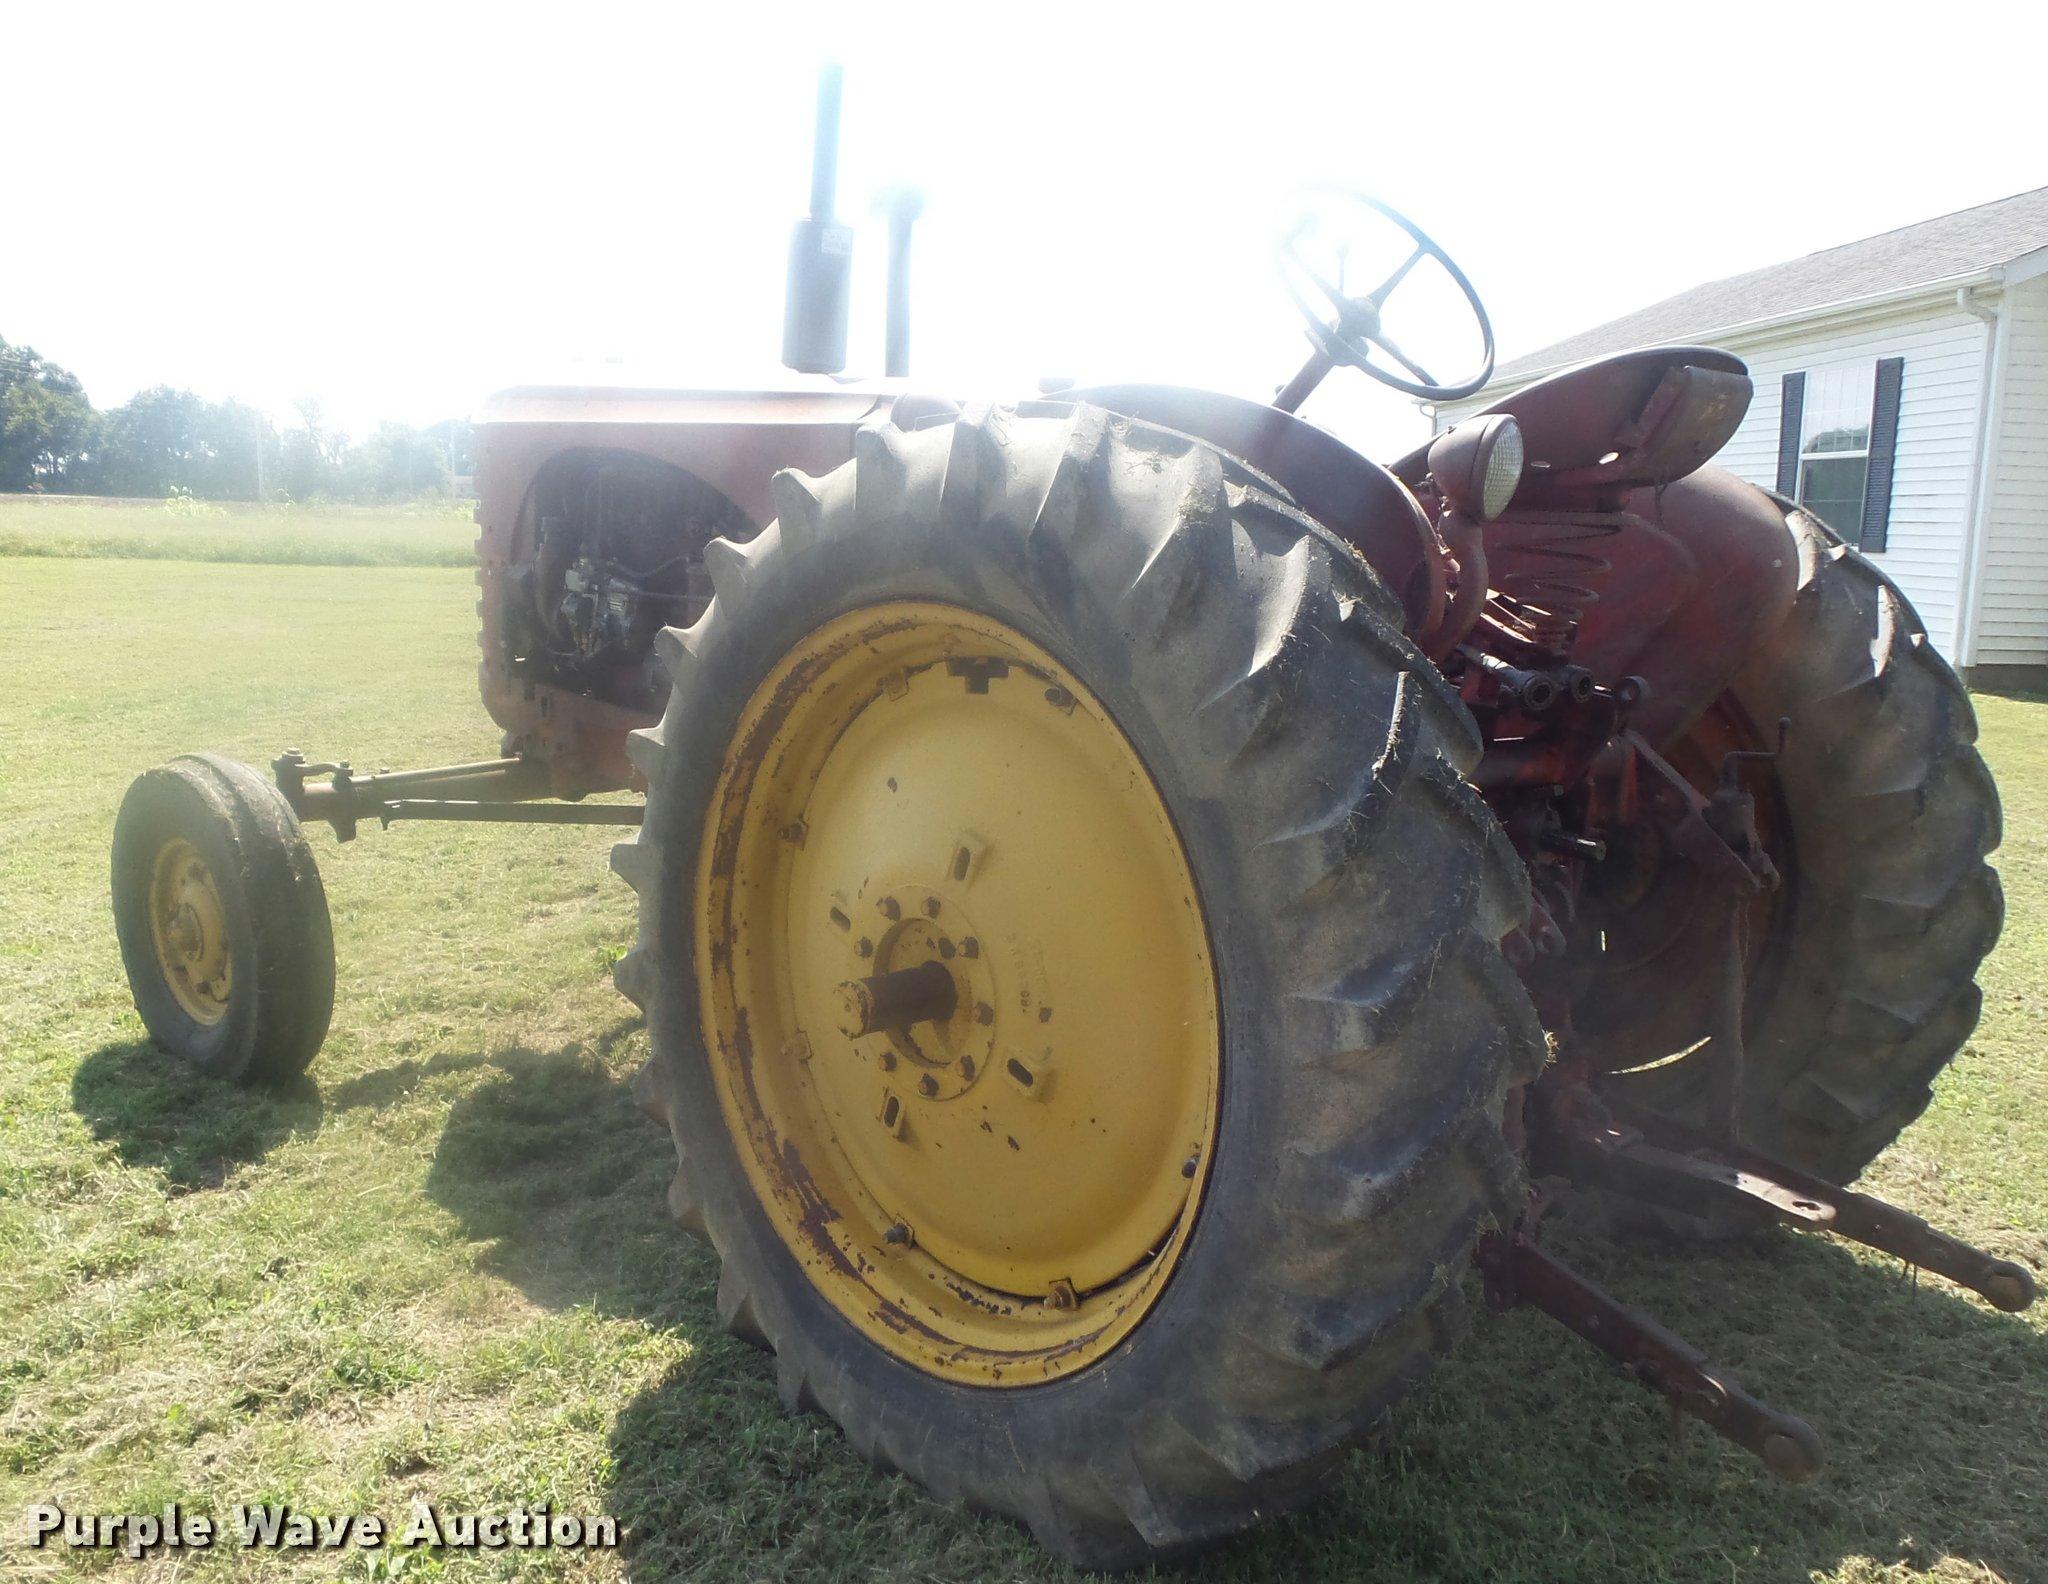 ... Massey-Harris 44 Special Diesel tractor Full size in new window ...